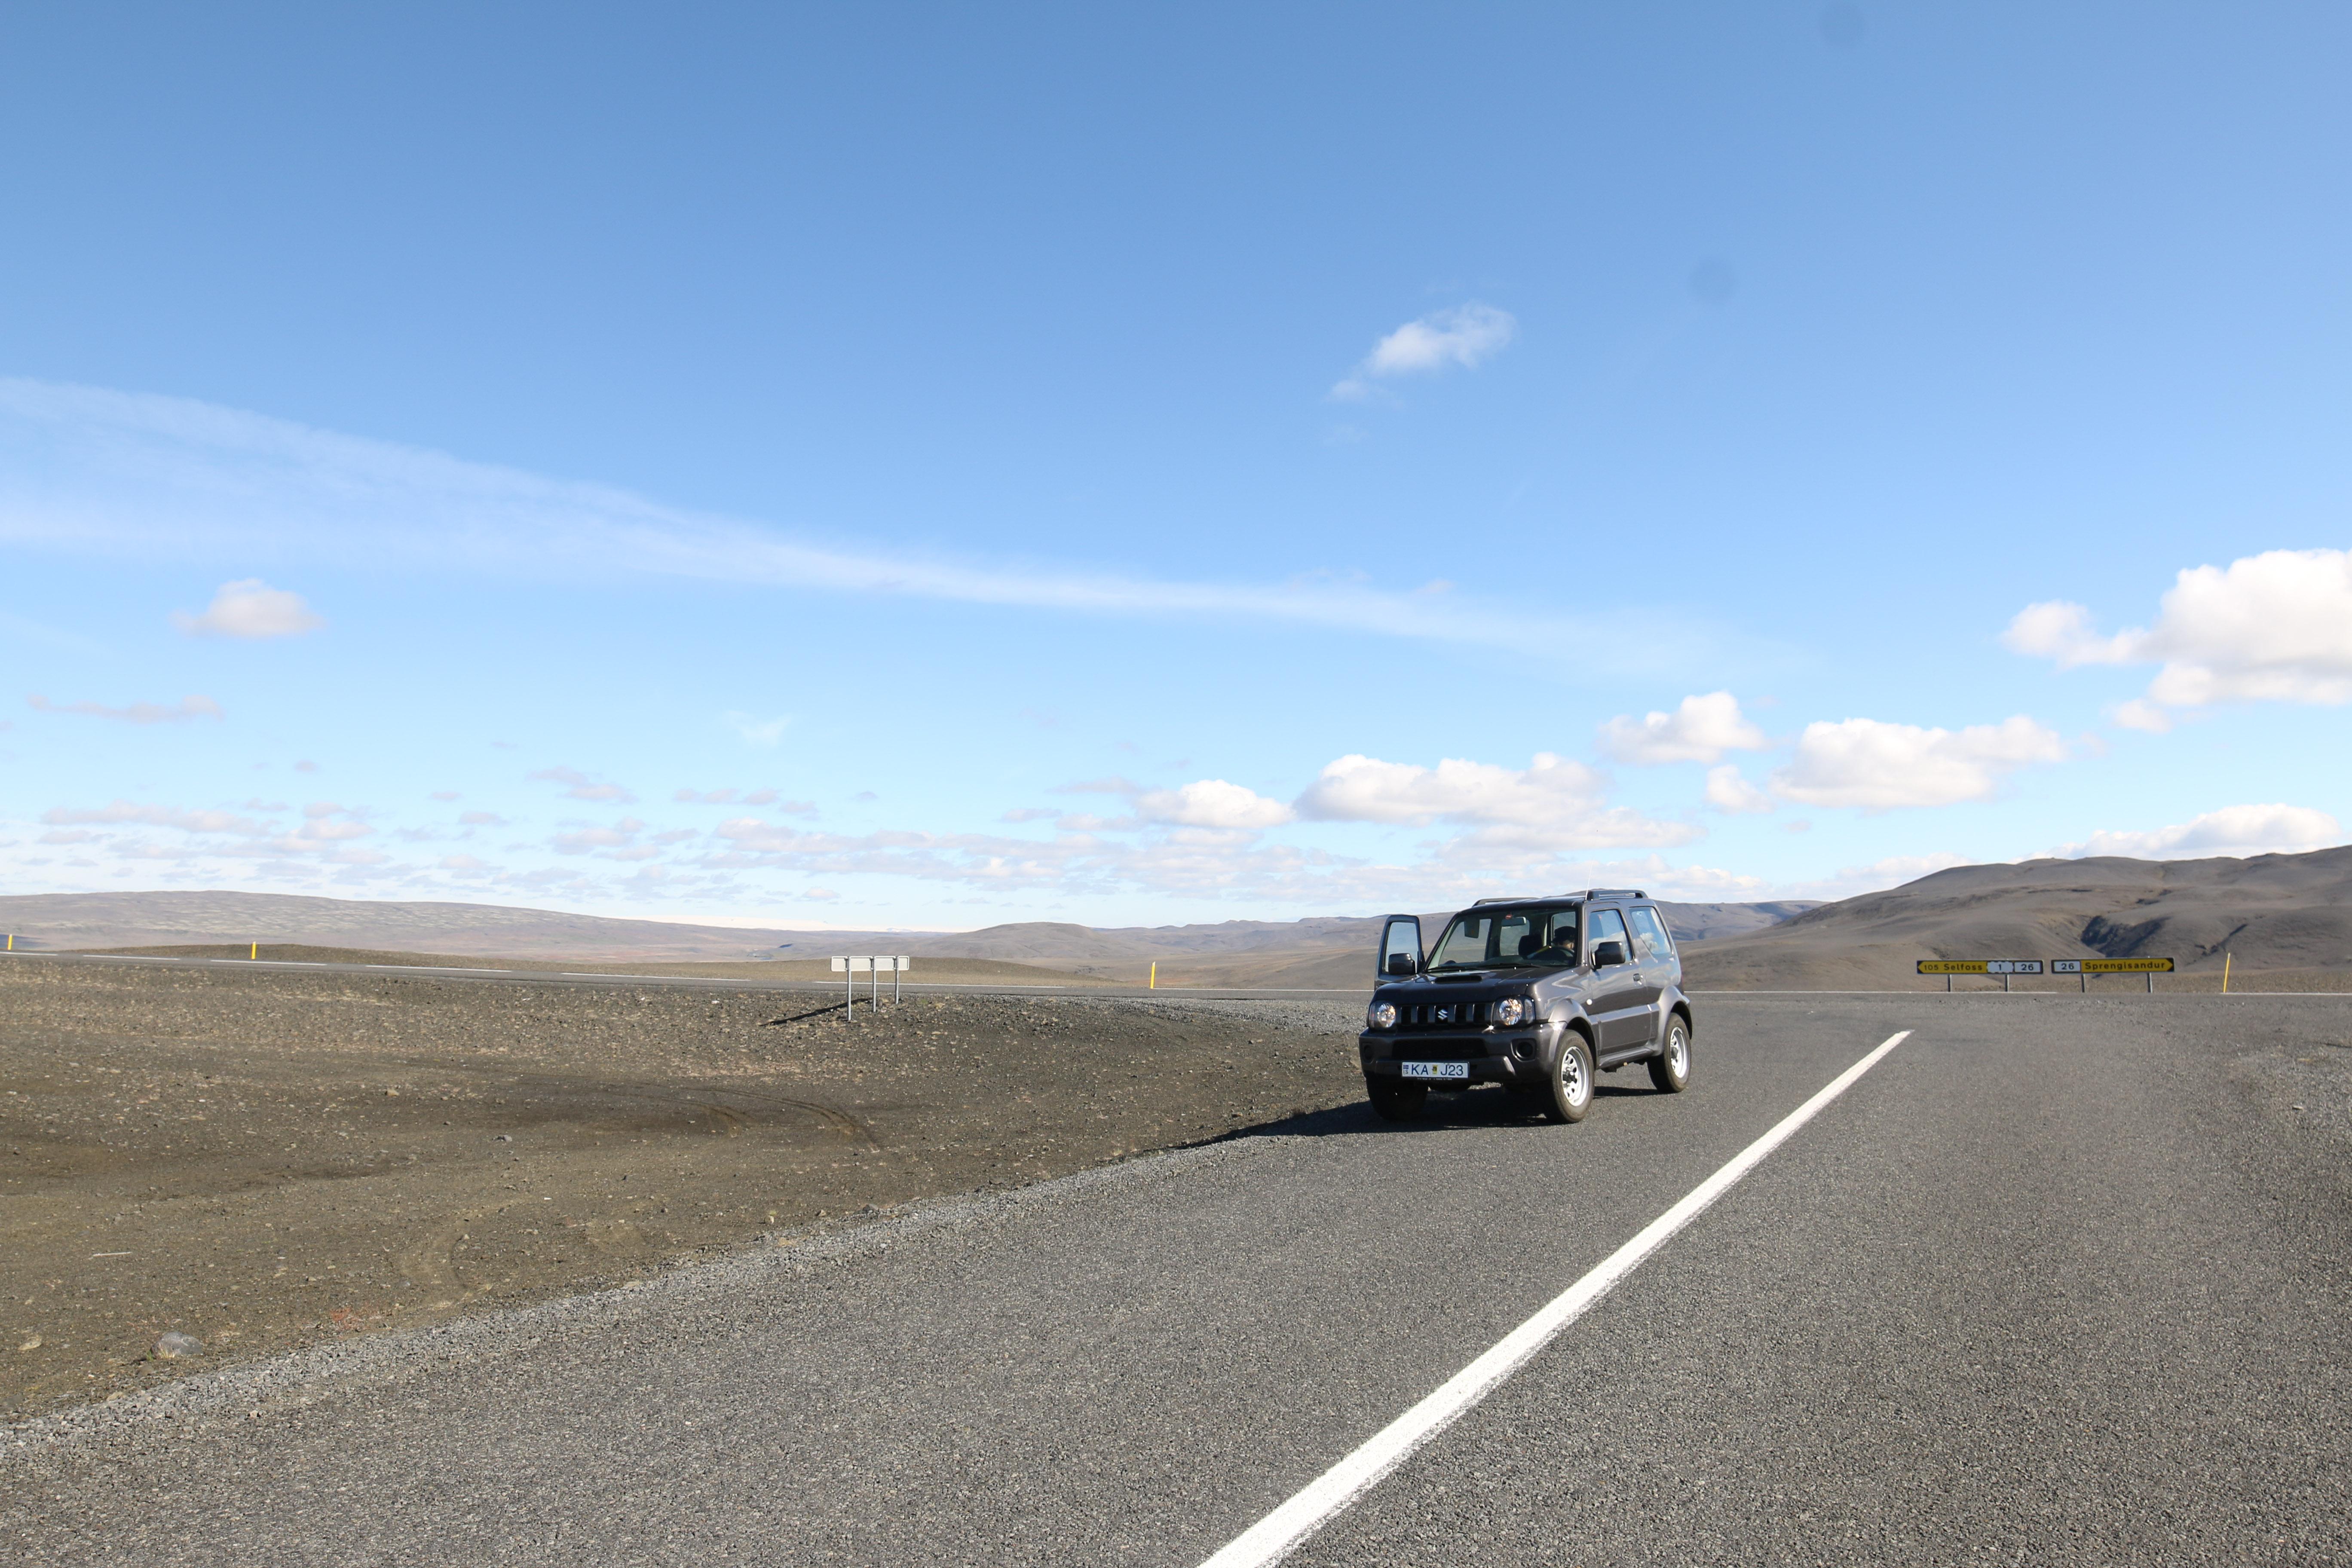 voyage en islande pendant 8 jours avec ma maman I Sp4nkblog_-5